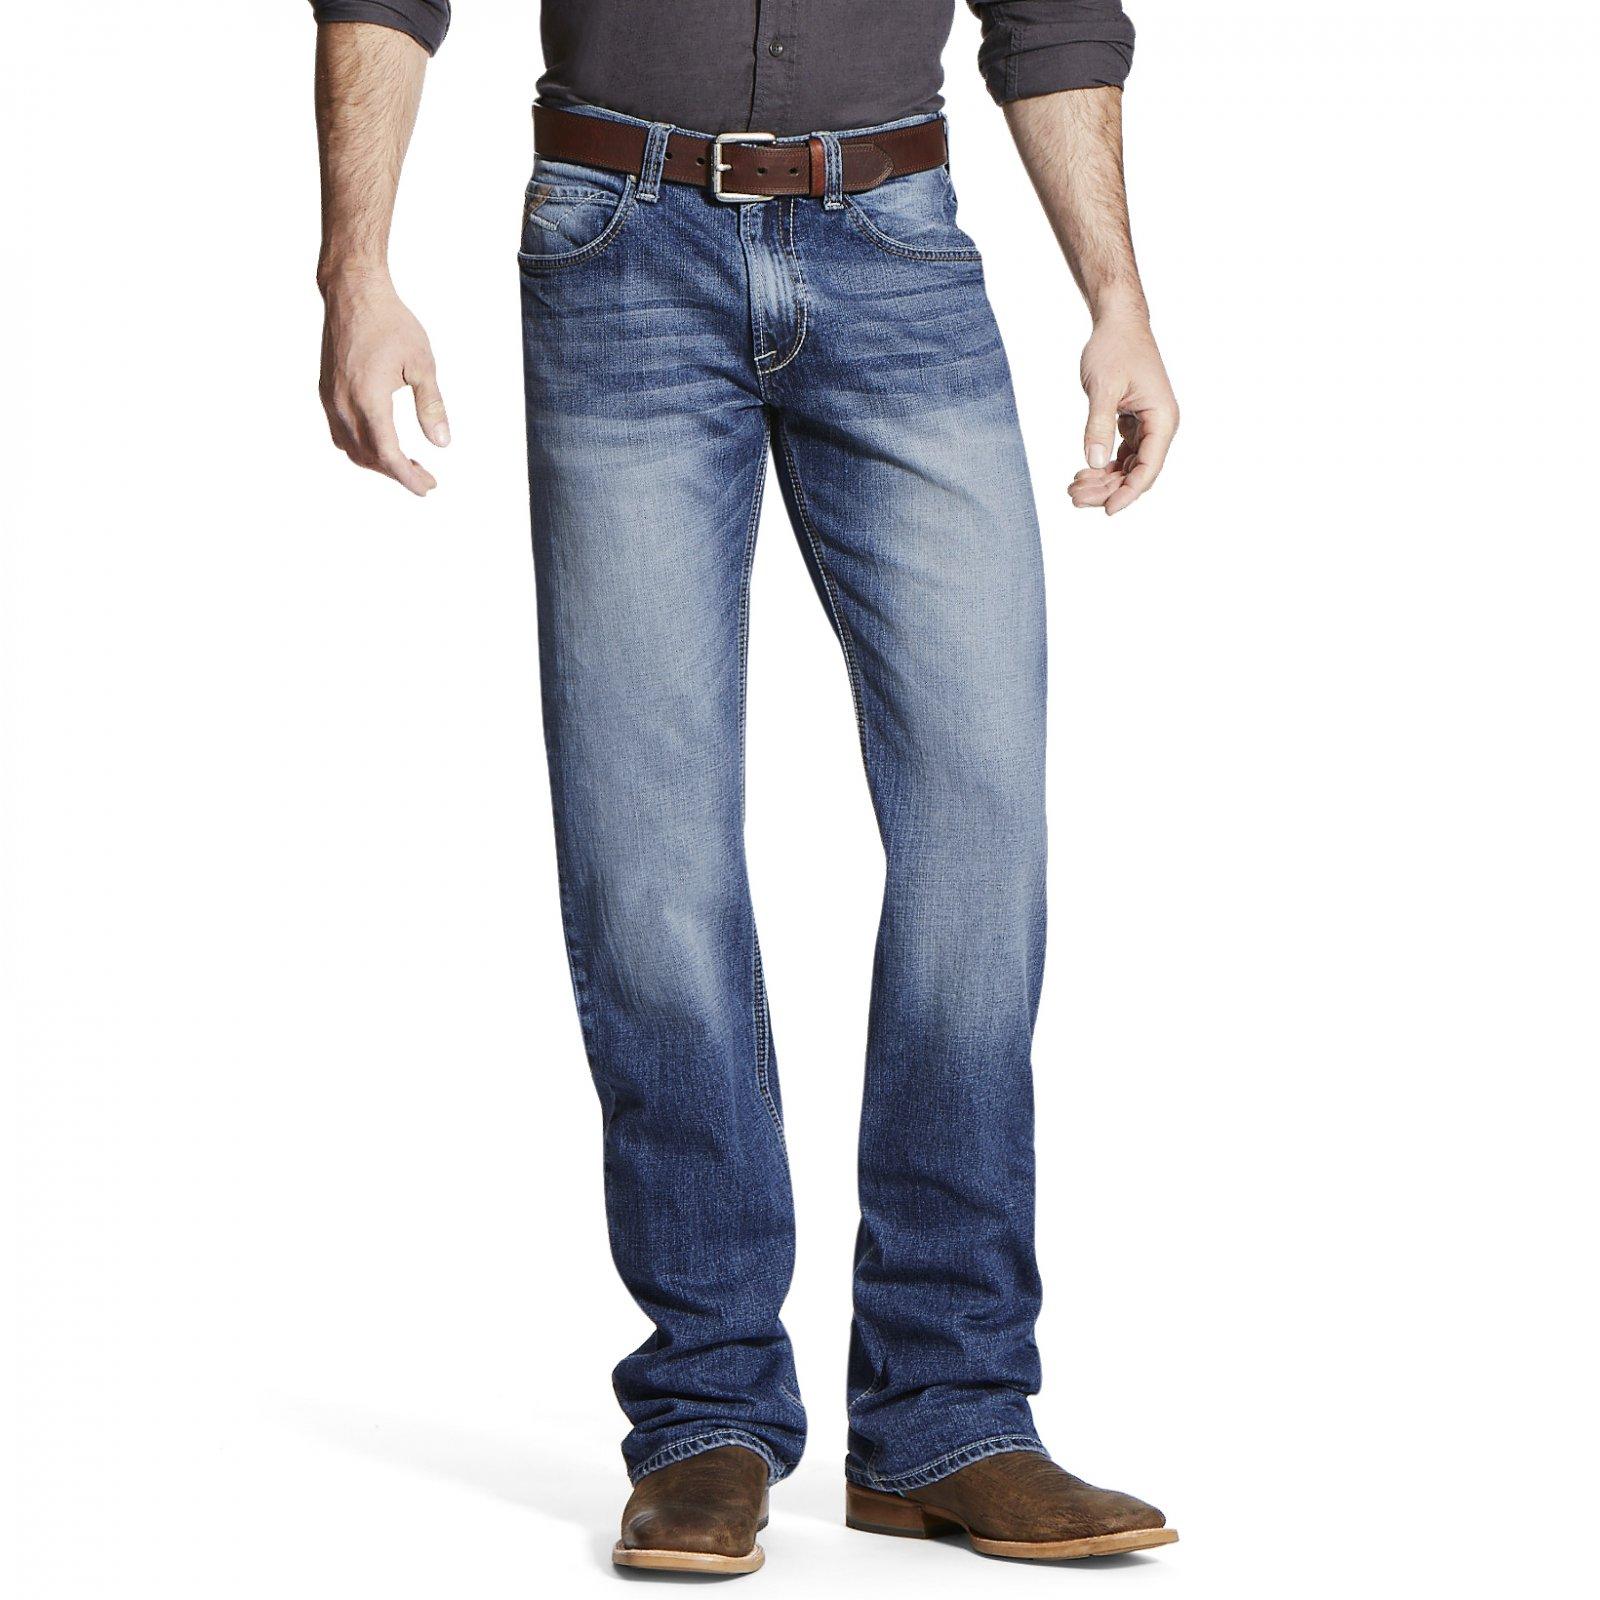 Men's M4 Cole Fargo Jean from Ariat